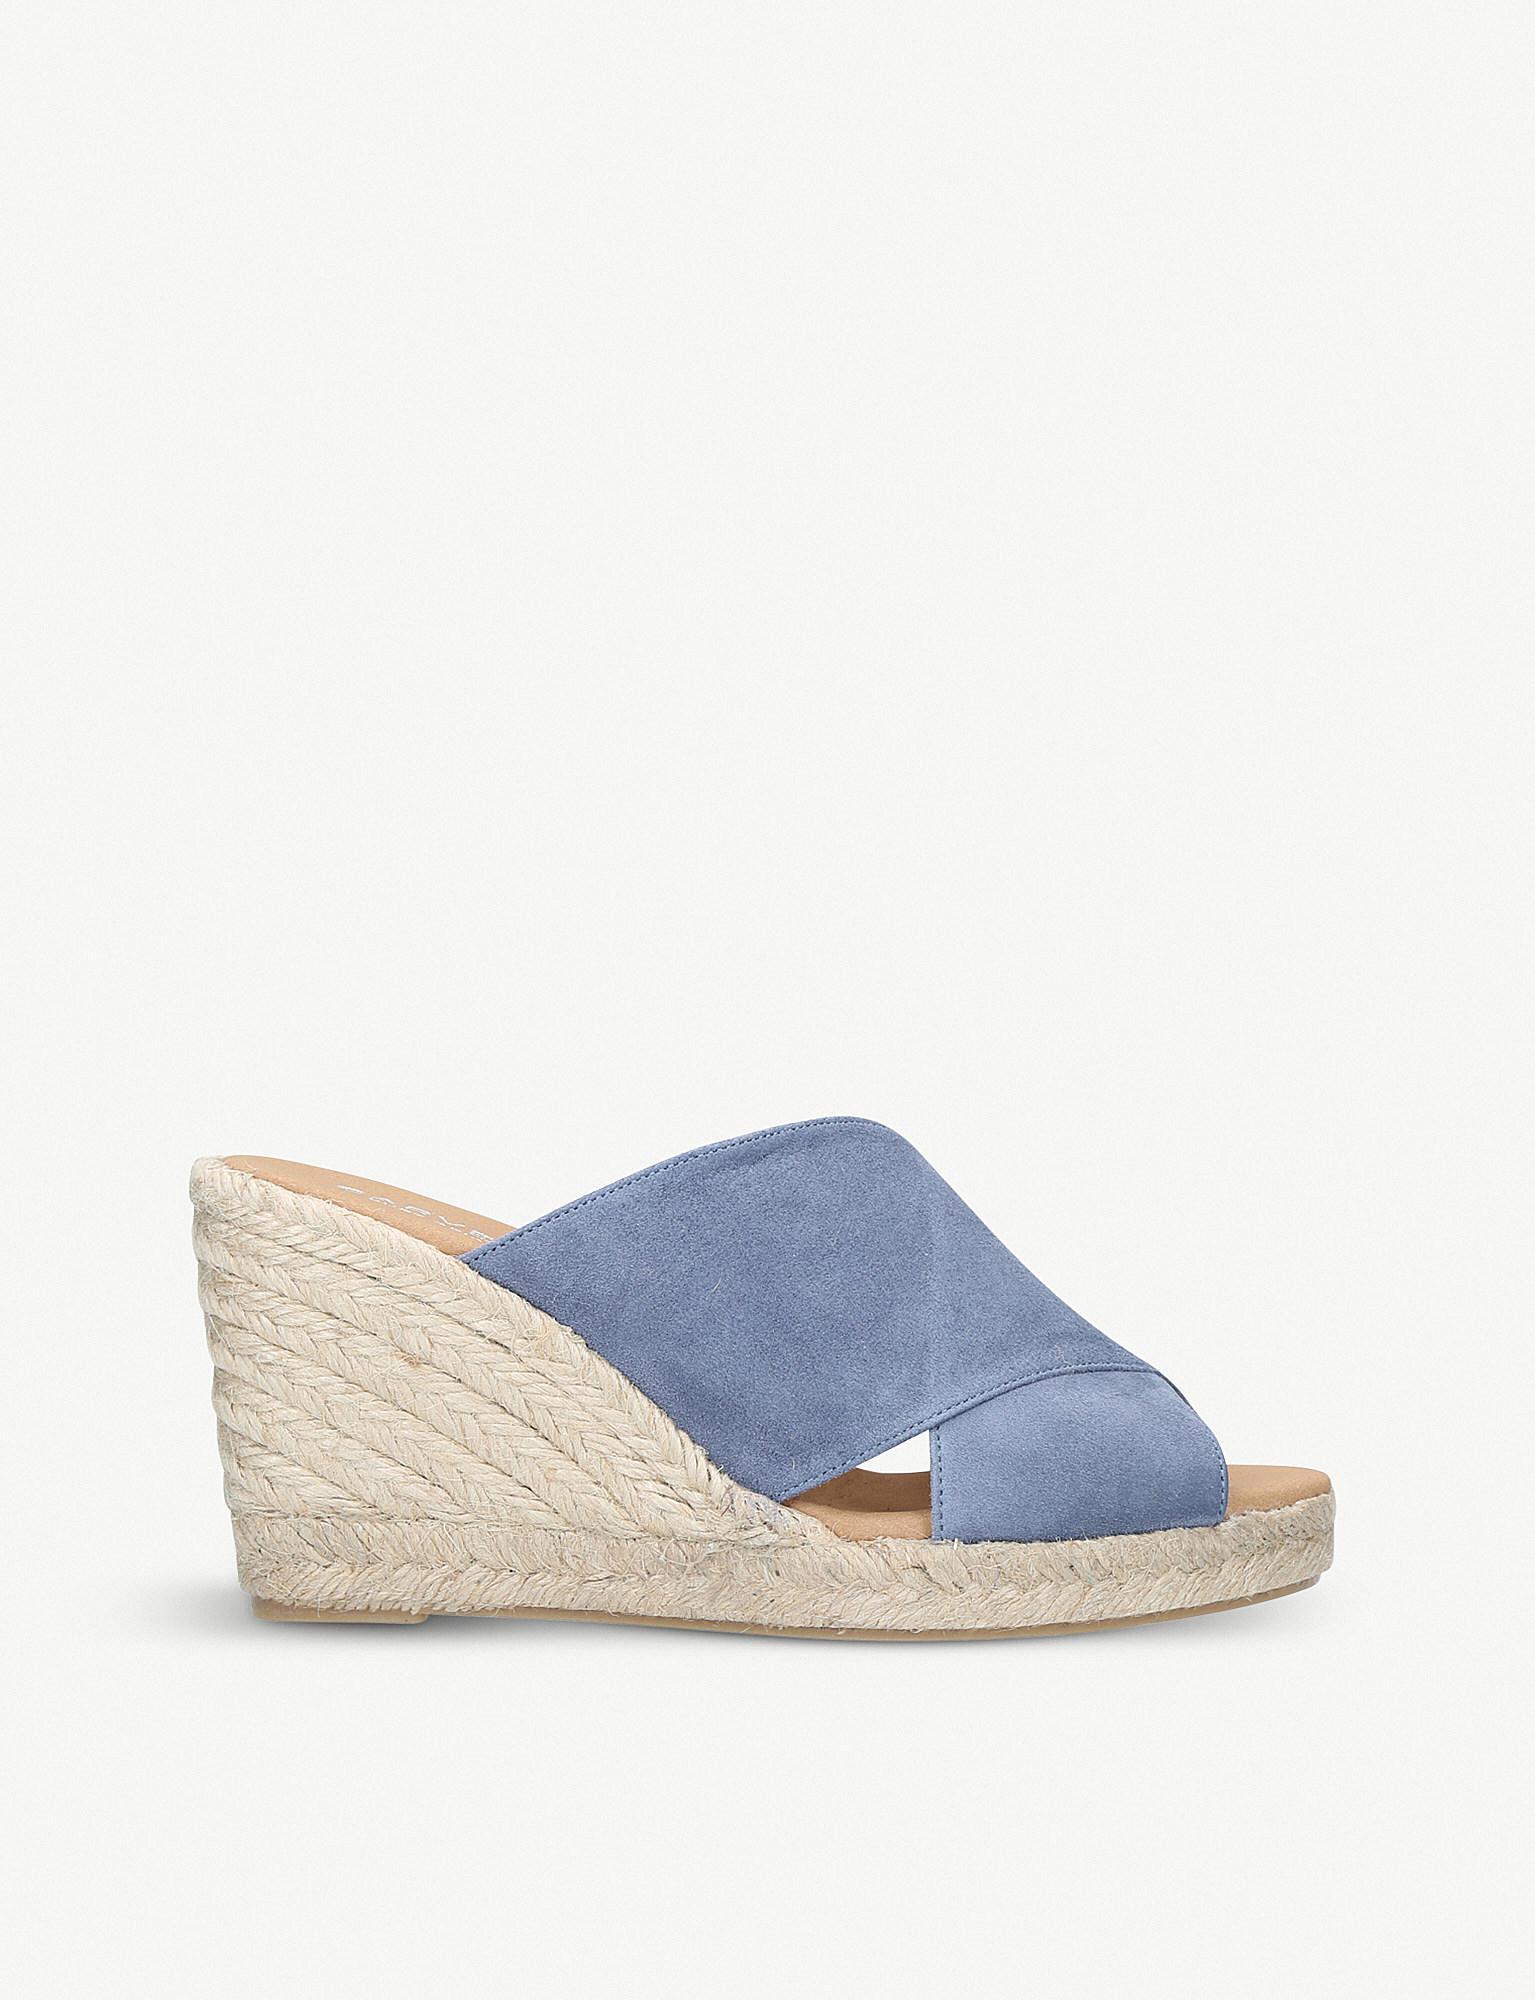 3c57fdf30816 Carvela Kurt Geiger Karp Leather Wedge Mules in Blue - Save 58% - Lyst